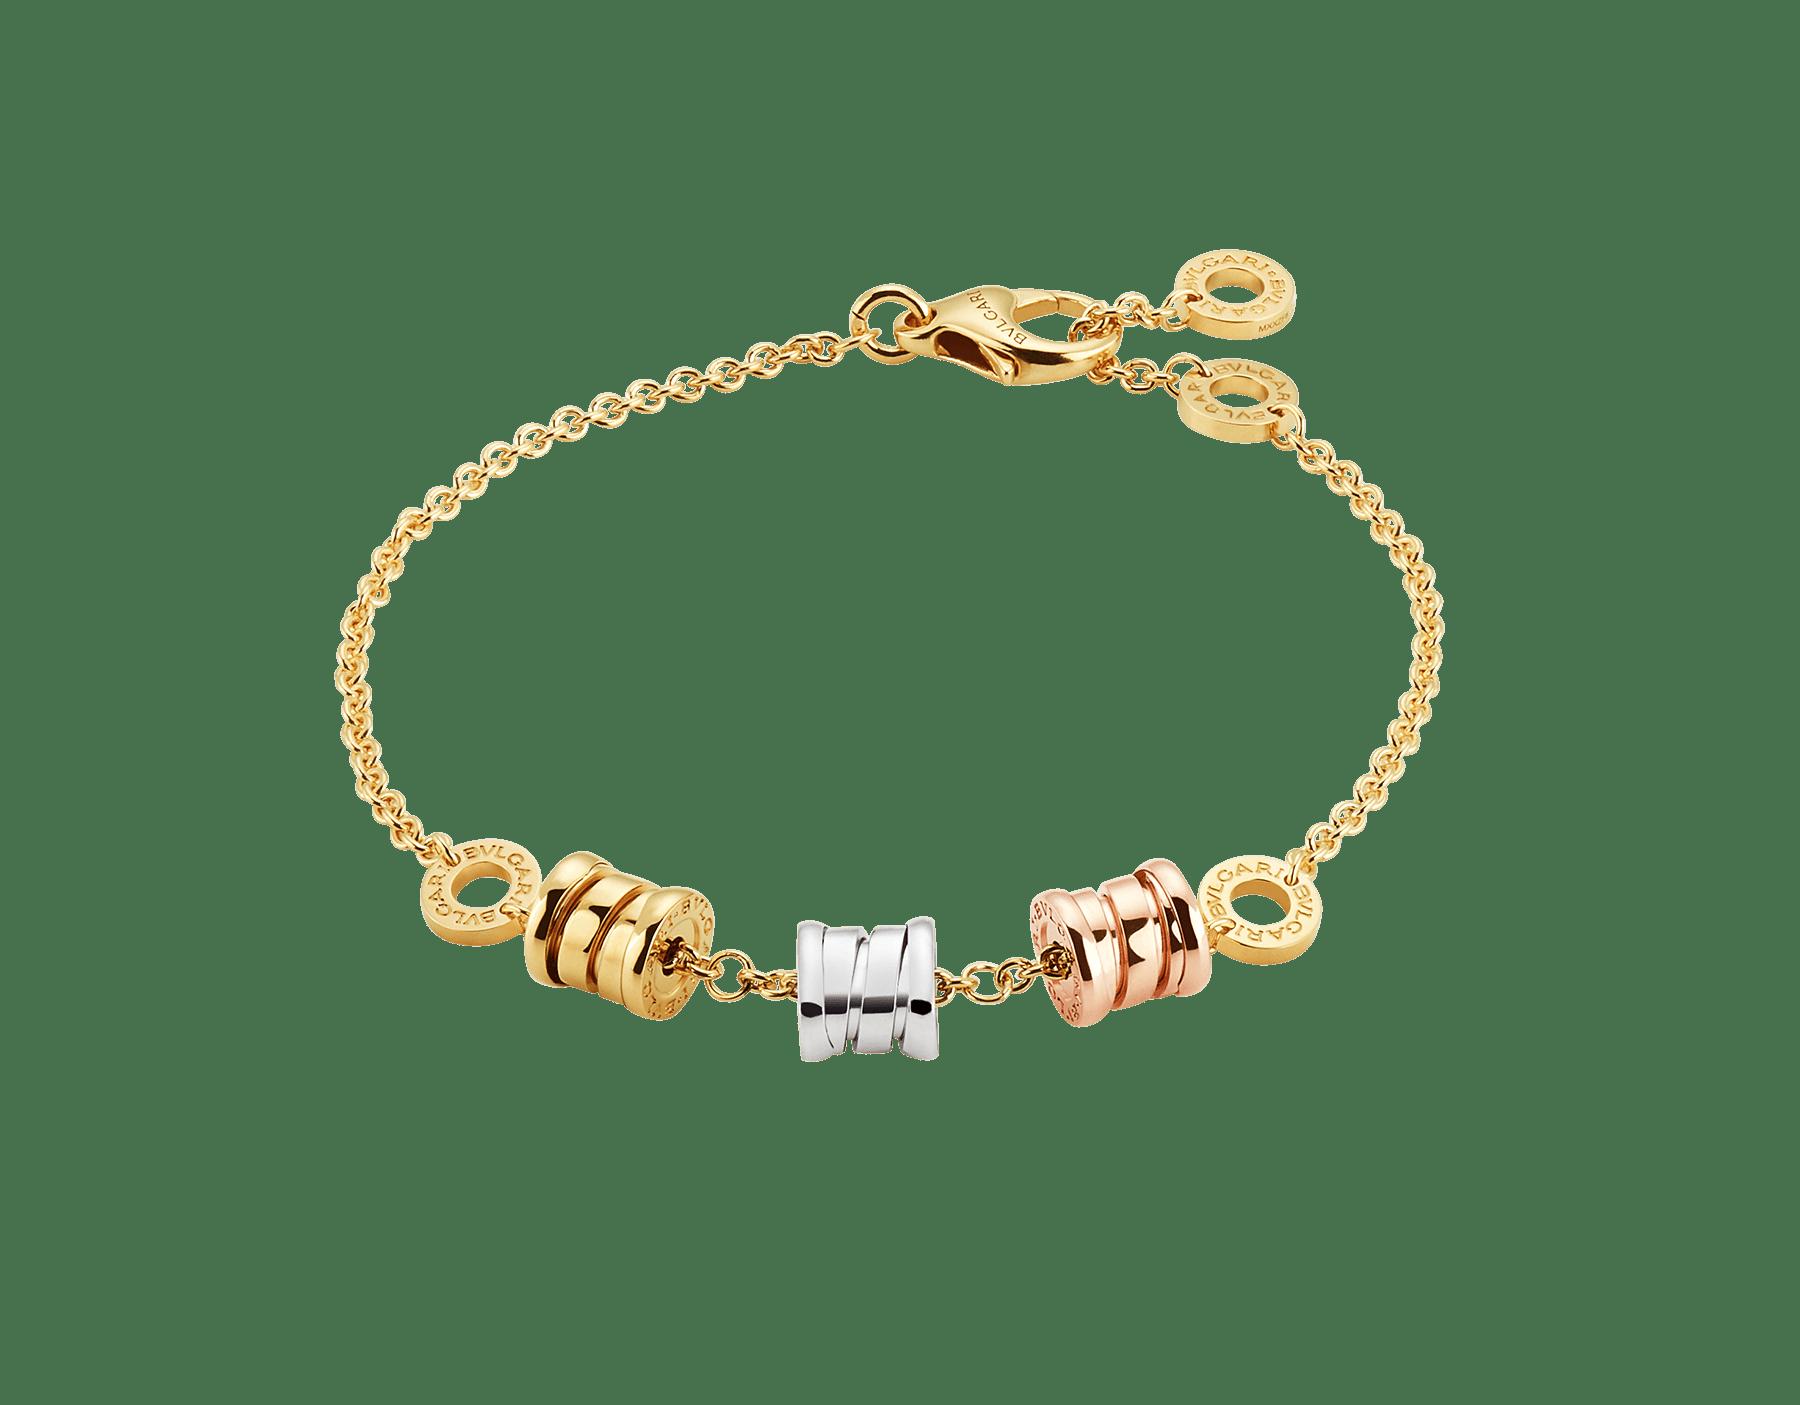 Браслет-цепочка B.zero1, цепочка из желтого золота 18 карат, три спирали из желтого, белого и розового золота 18 карат. BR853666 image 1